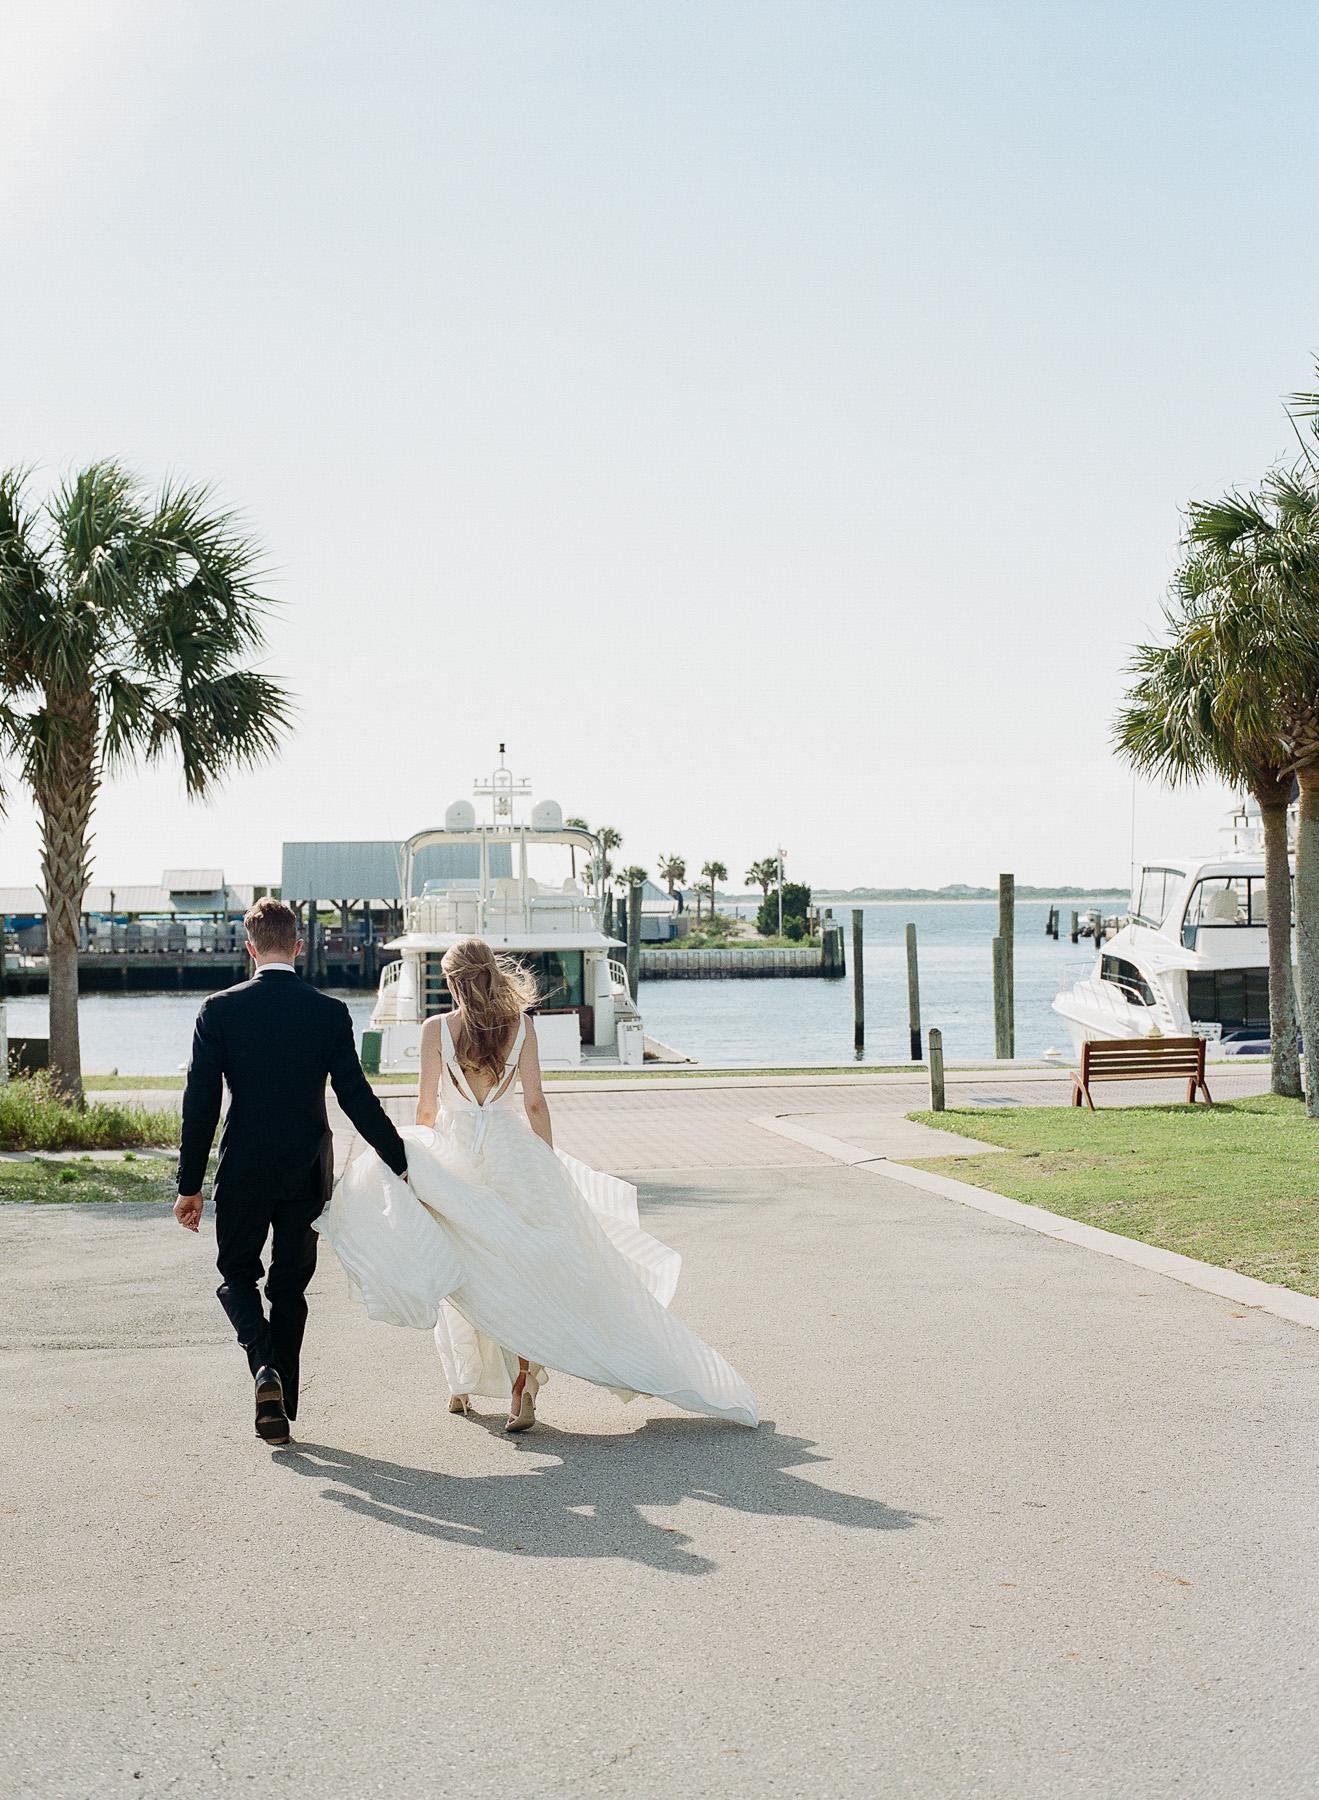 NC-wedding-photographer-best-14.jpg